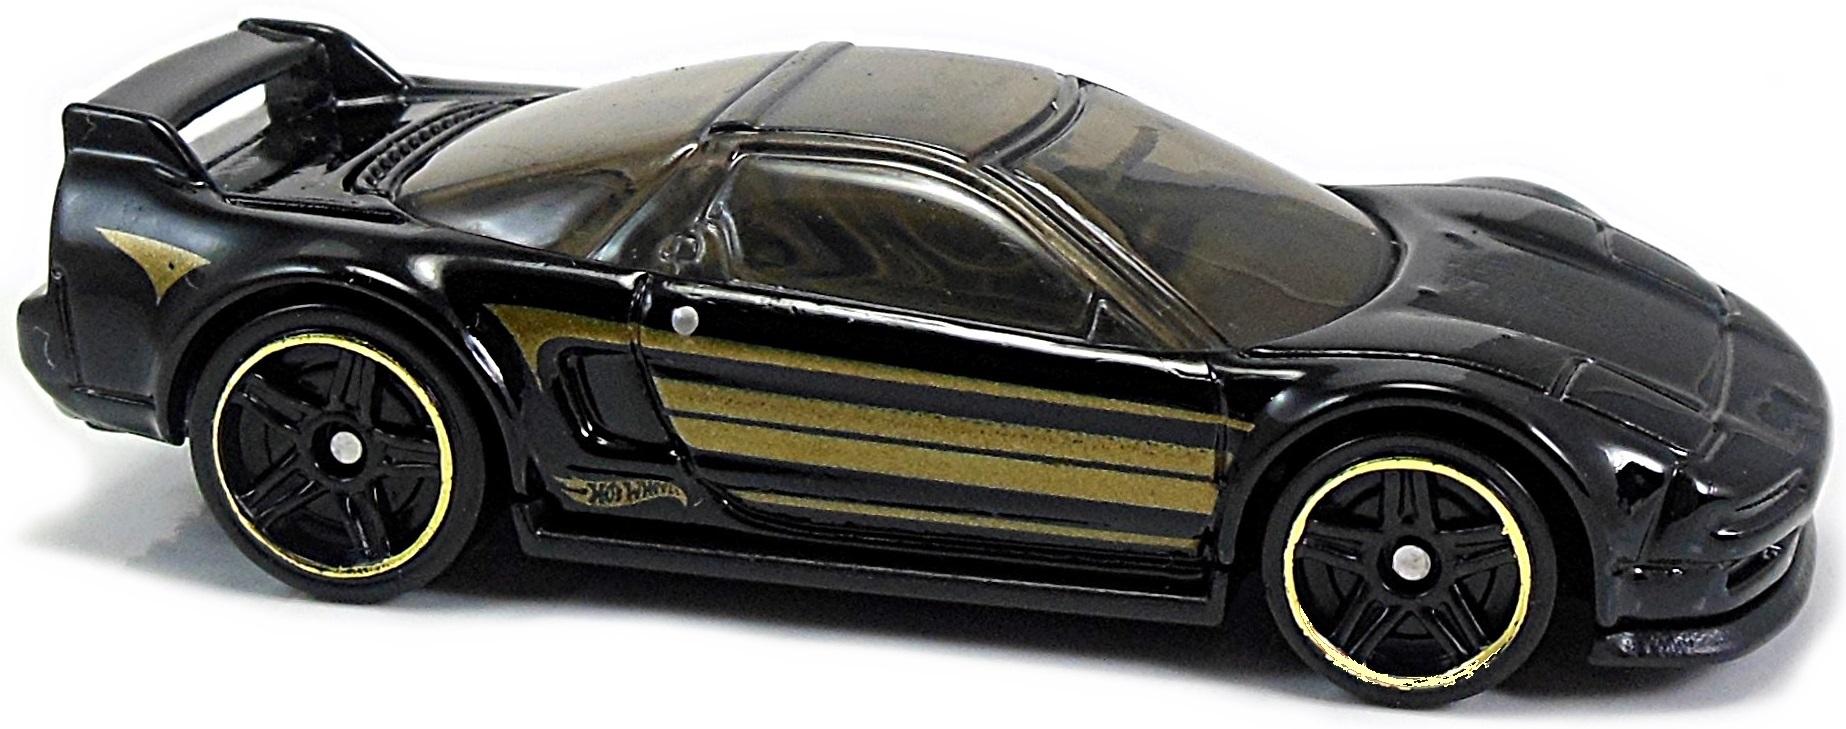 acura nsx 2015 black. f black as e gray int tinted windows some are almost clear gold stripes on sides pr5bkgdrim mal nightburnerz 262 2017 1 u2013 2 acura nsx 2015 u